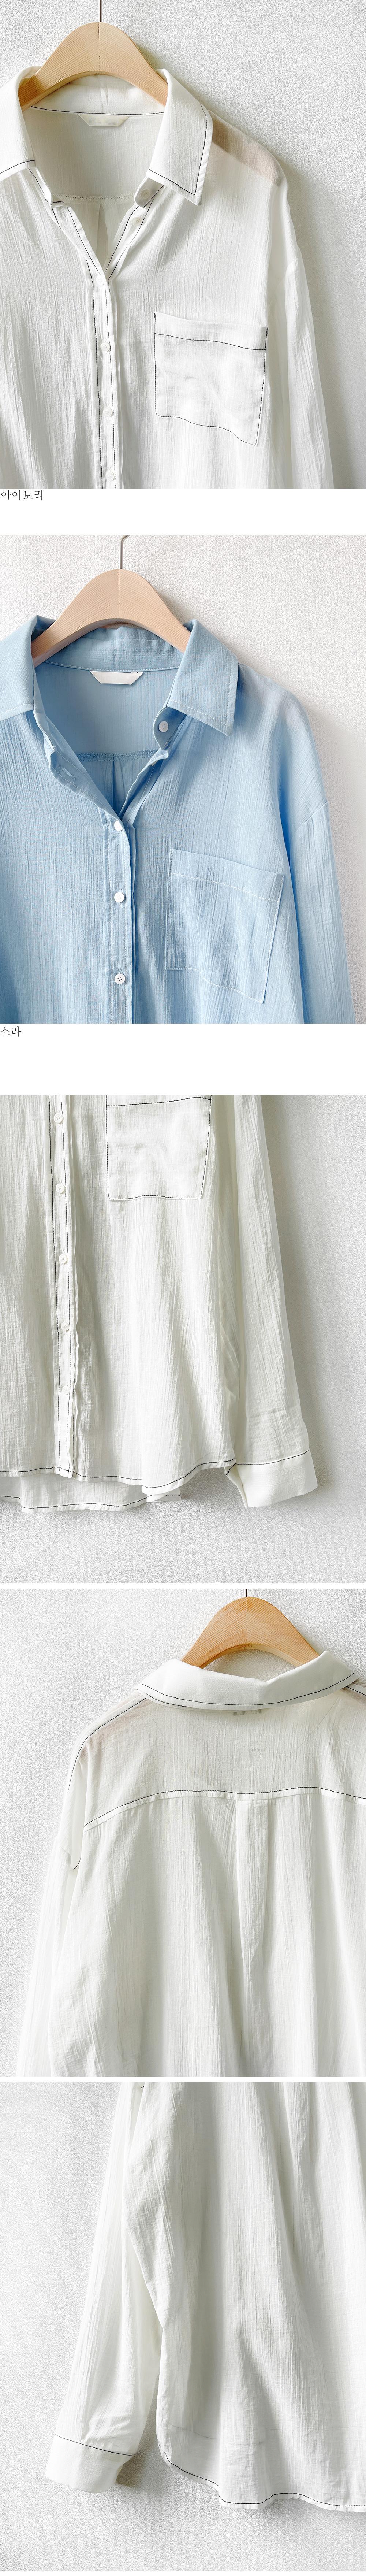 Stitched summer cotton shirt